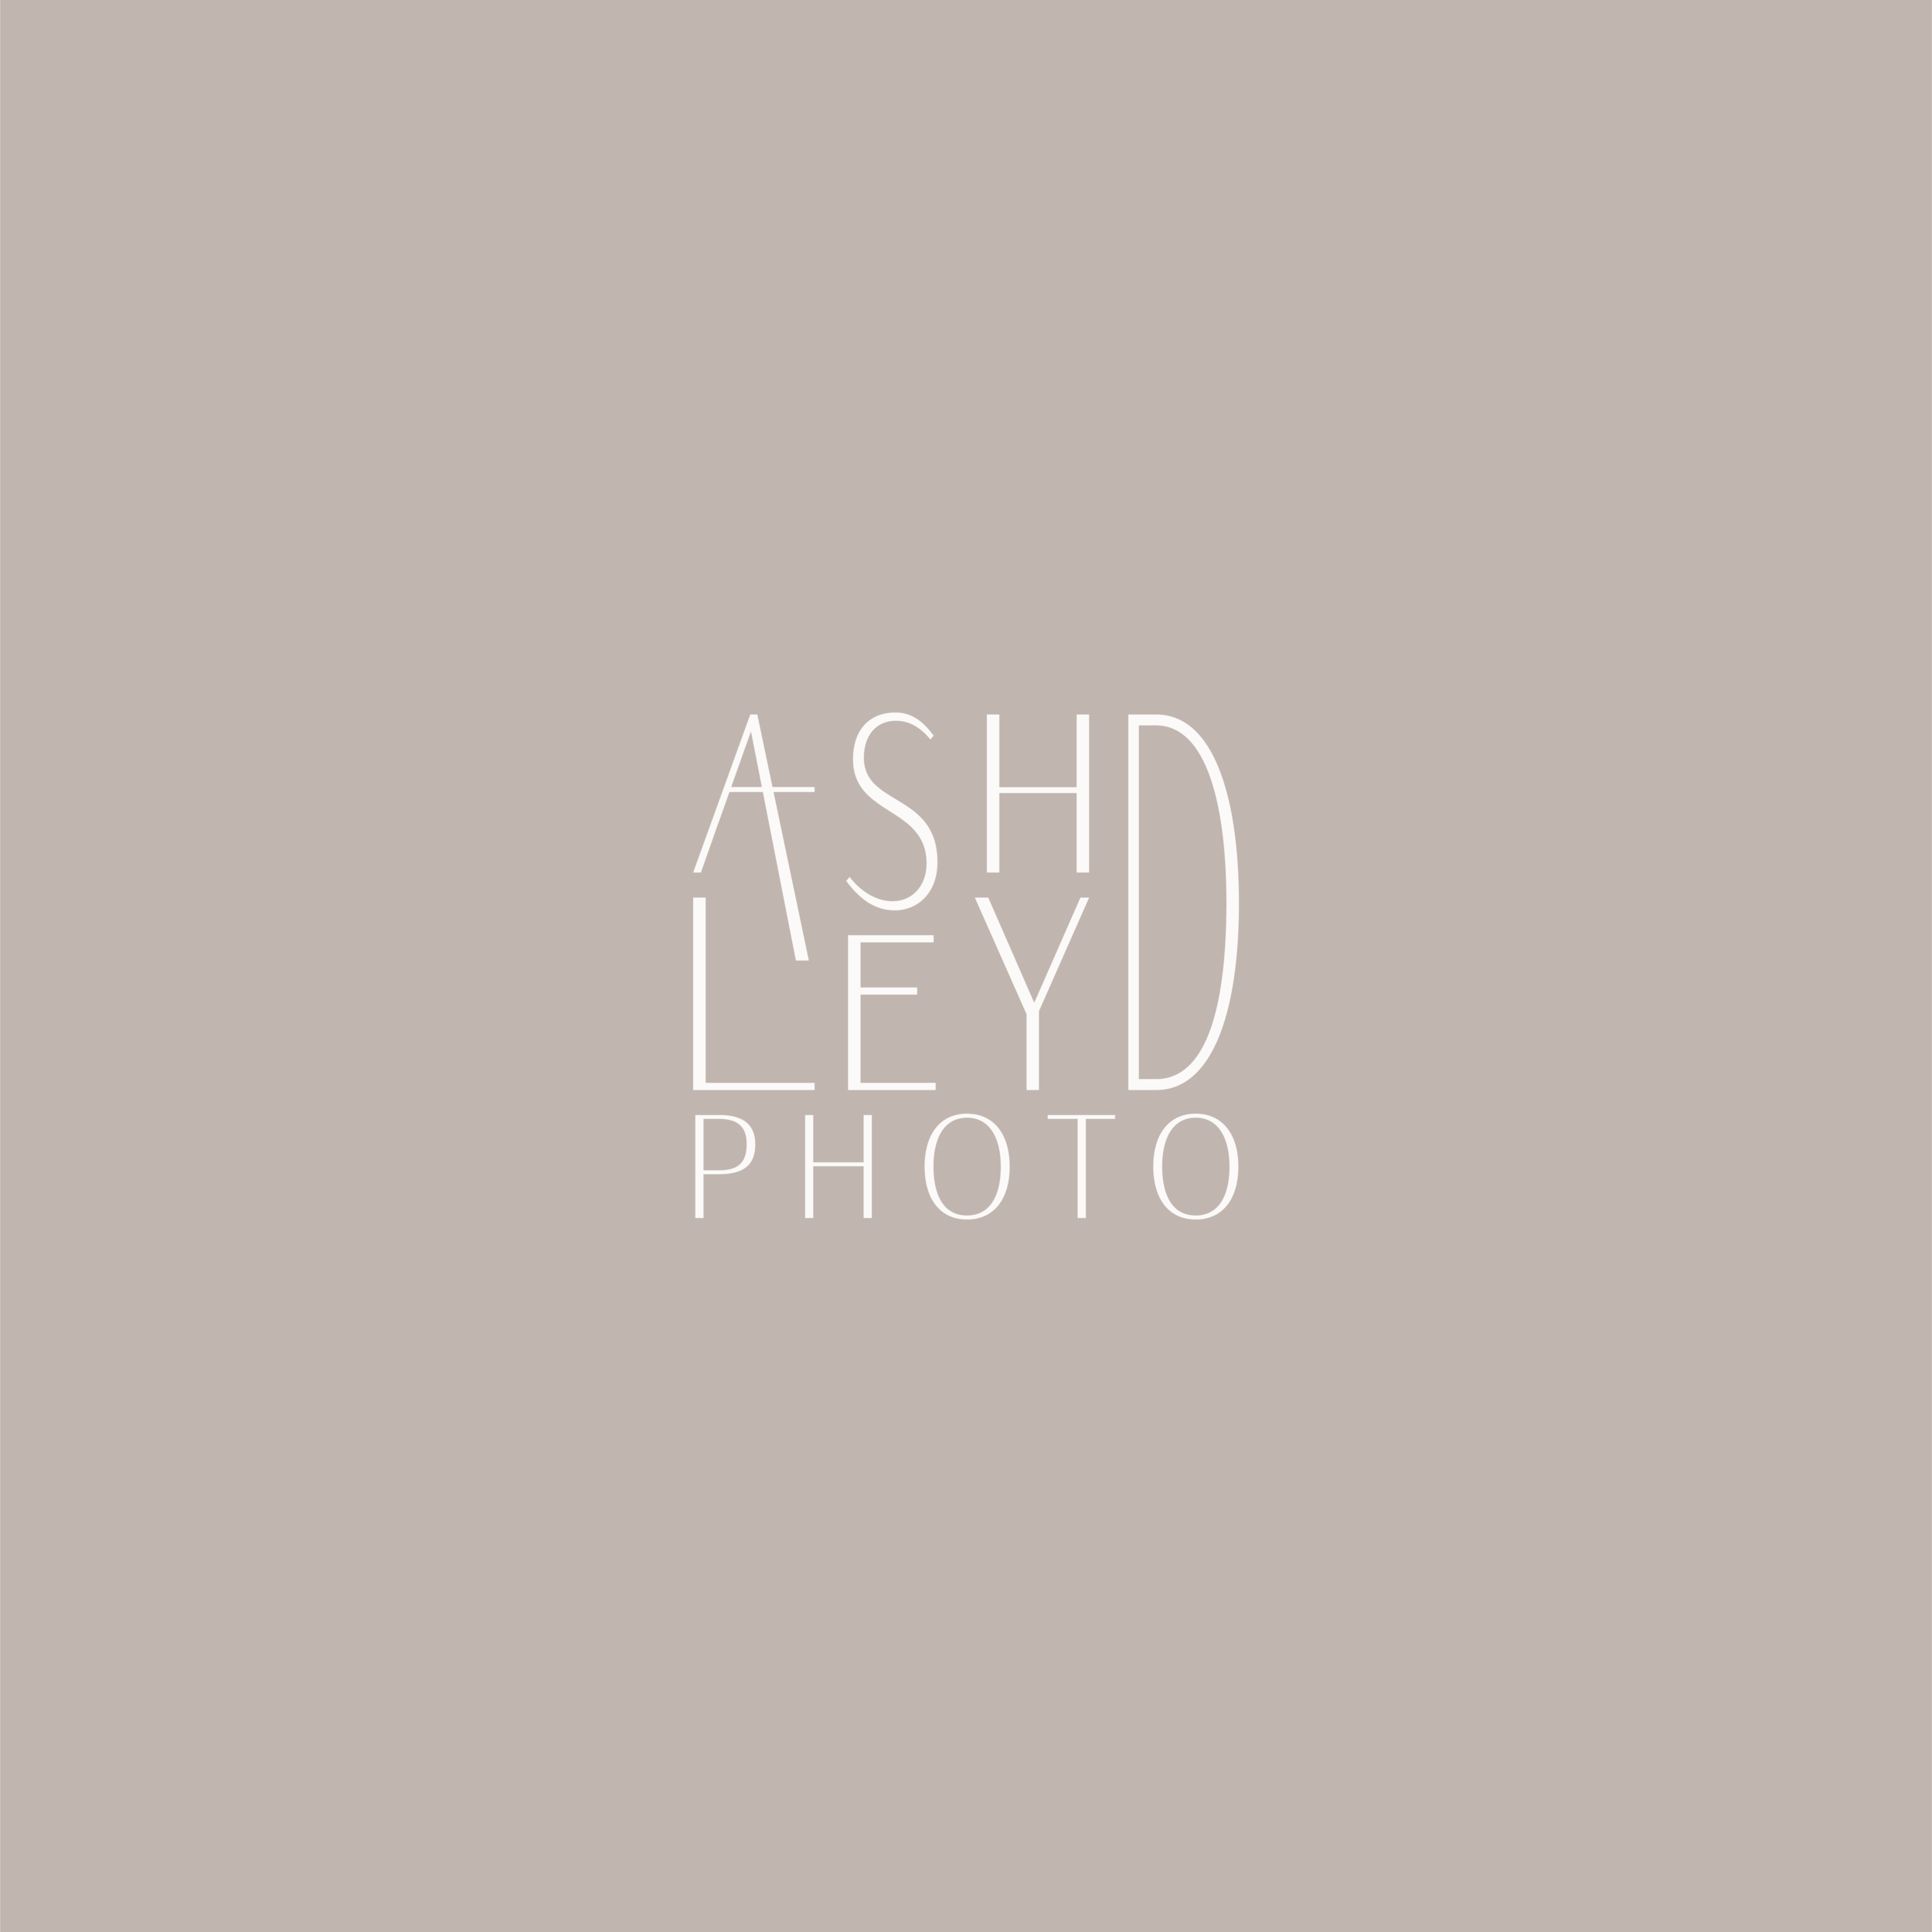 Ashley sm graphic logo draft-03.png